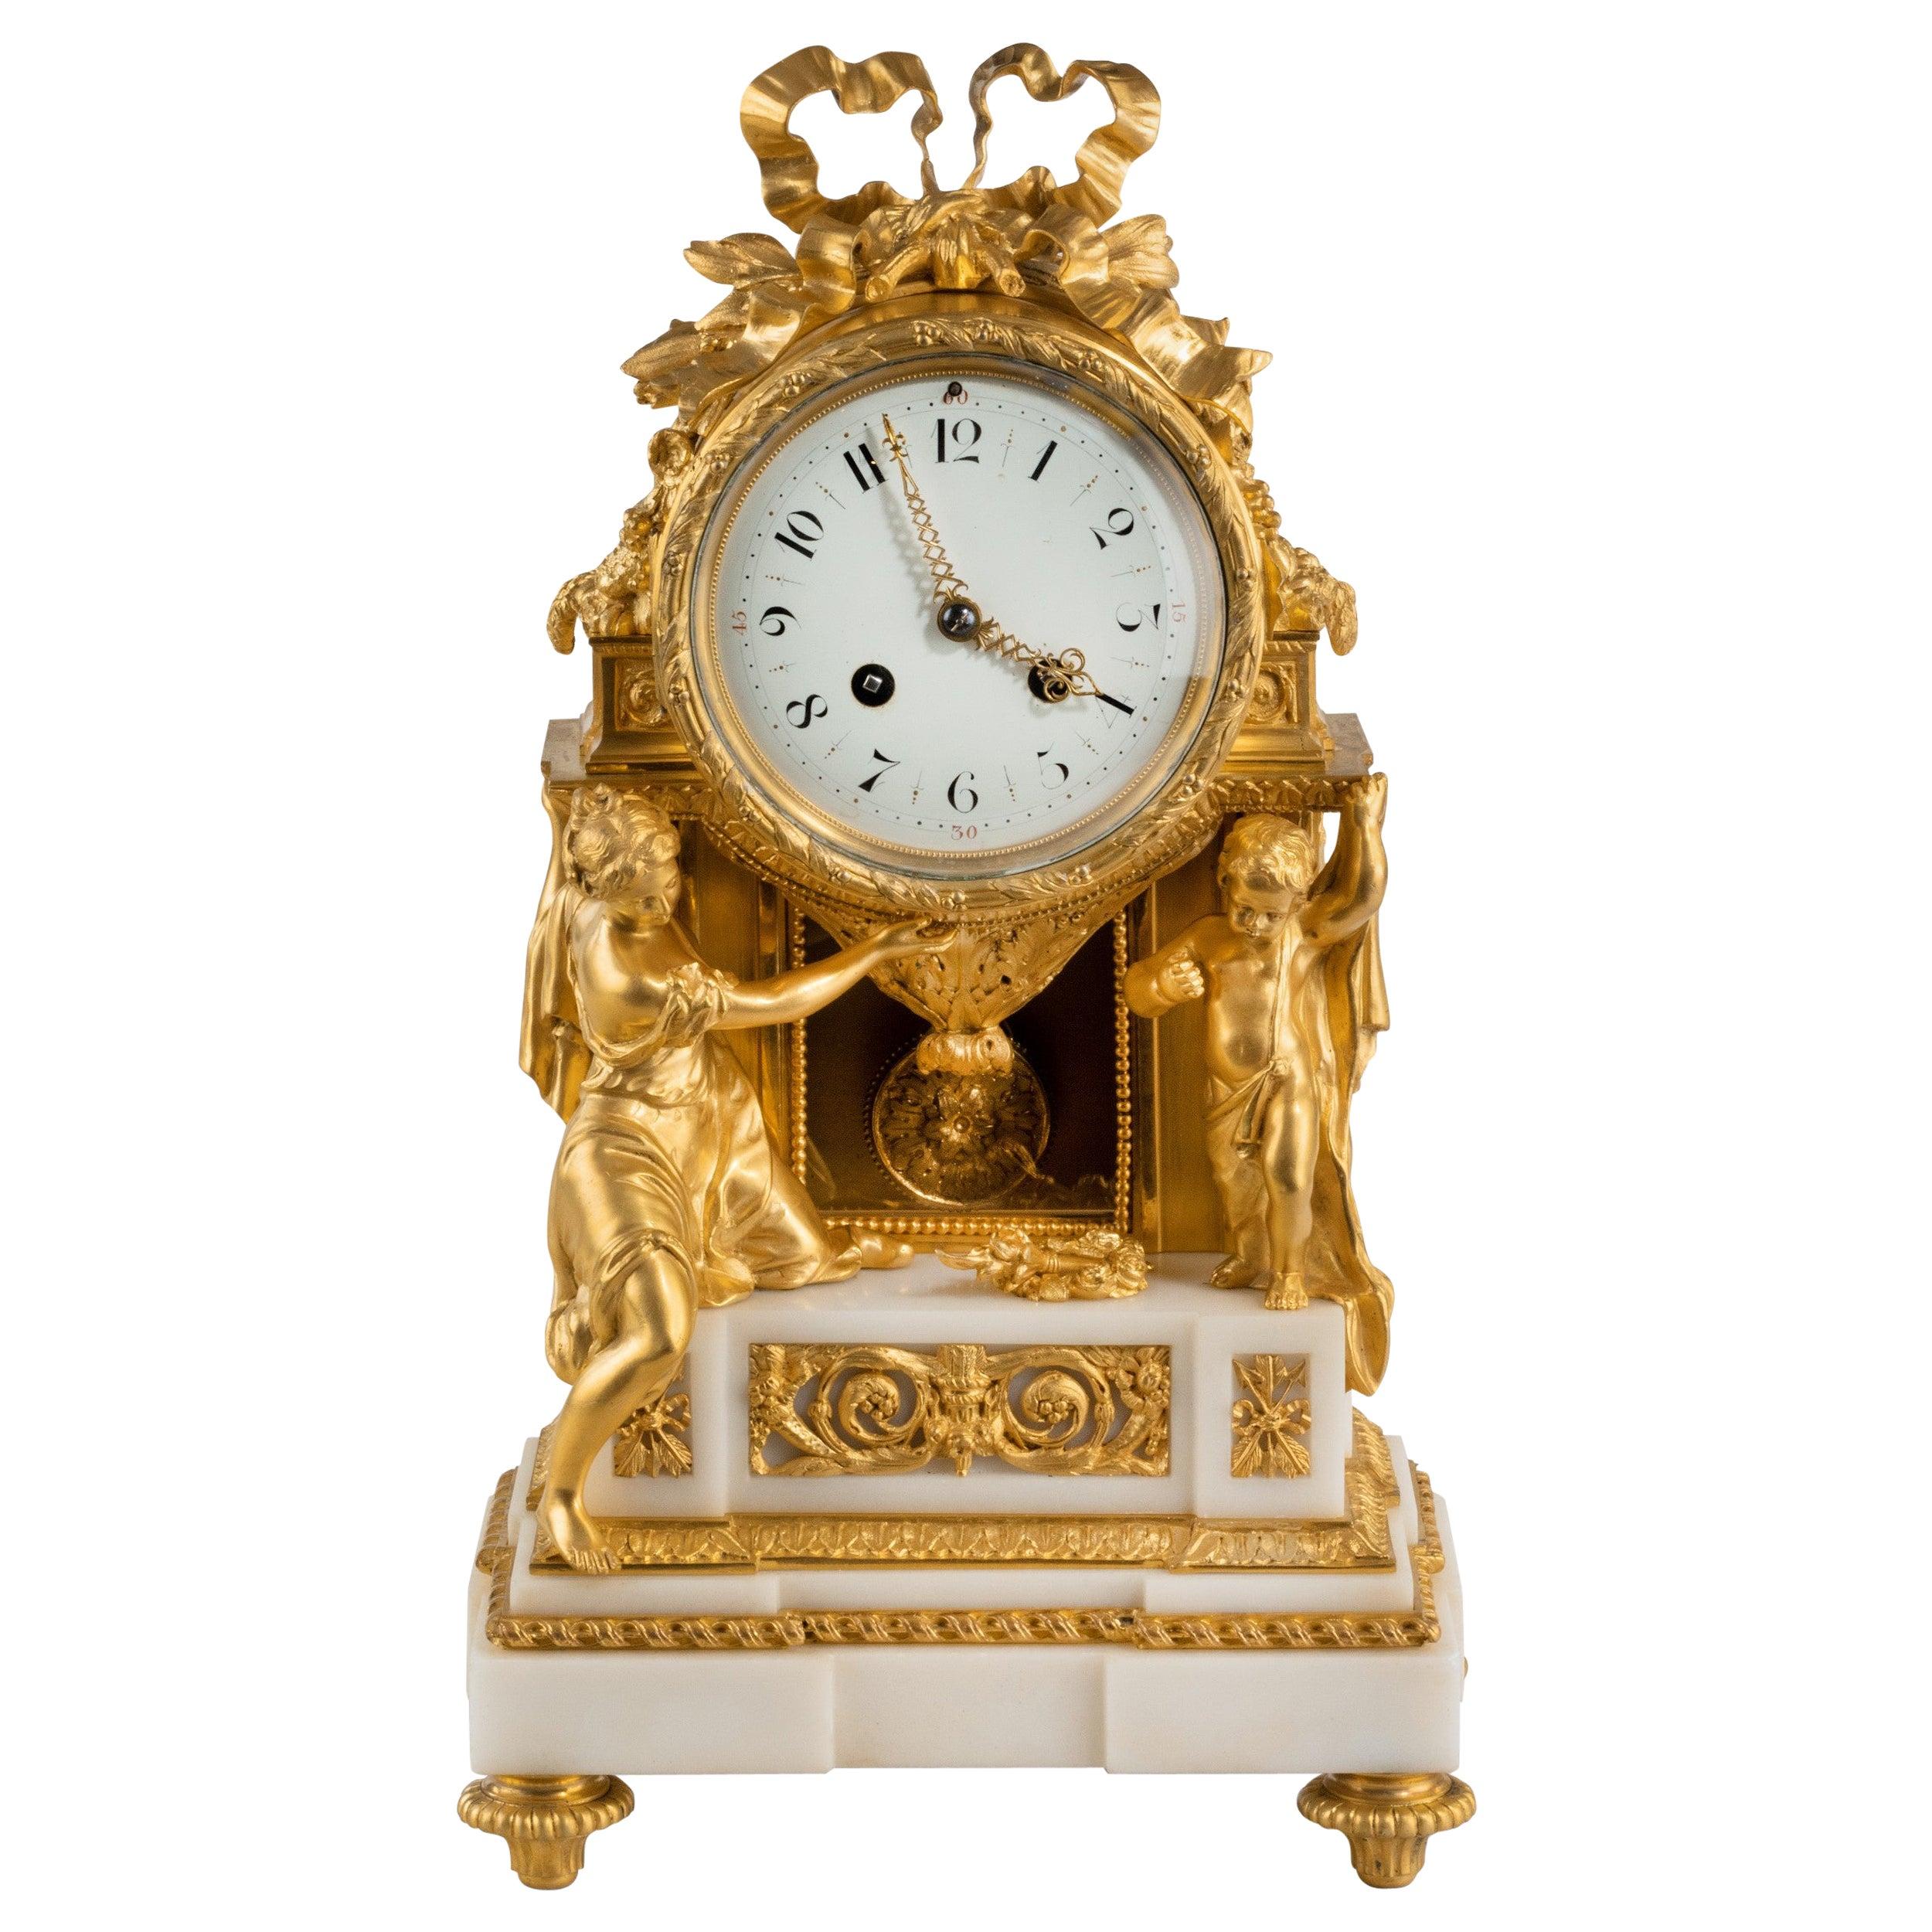 Gilt Bronze and Ormolu Mantle Clock by Samuel Marti